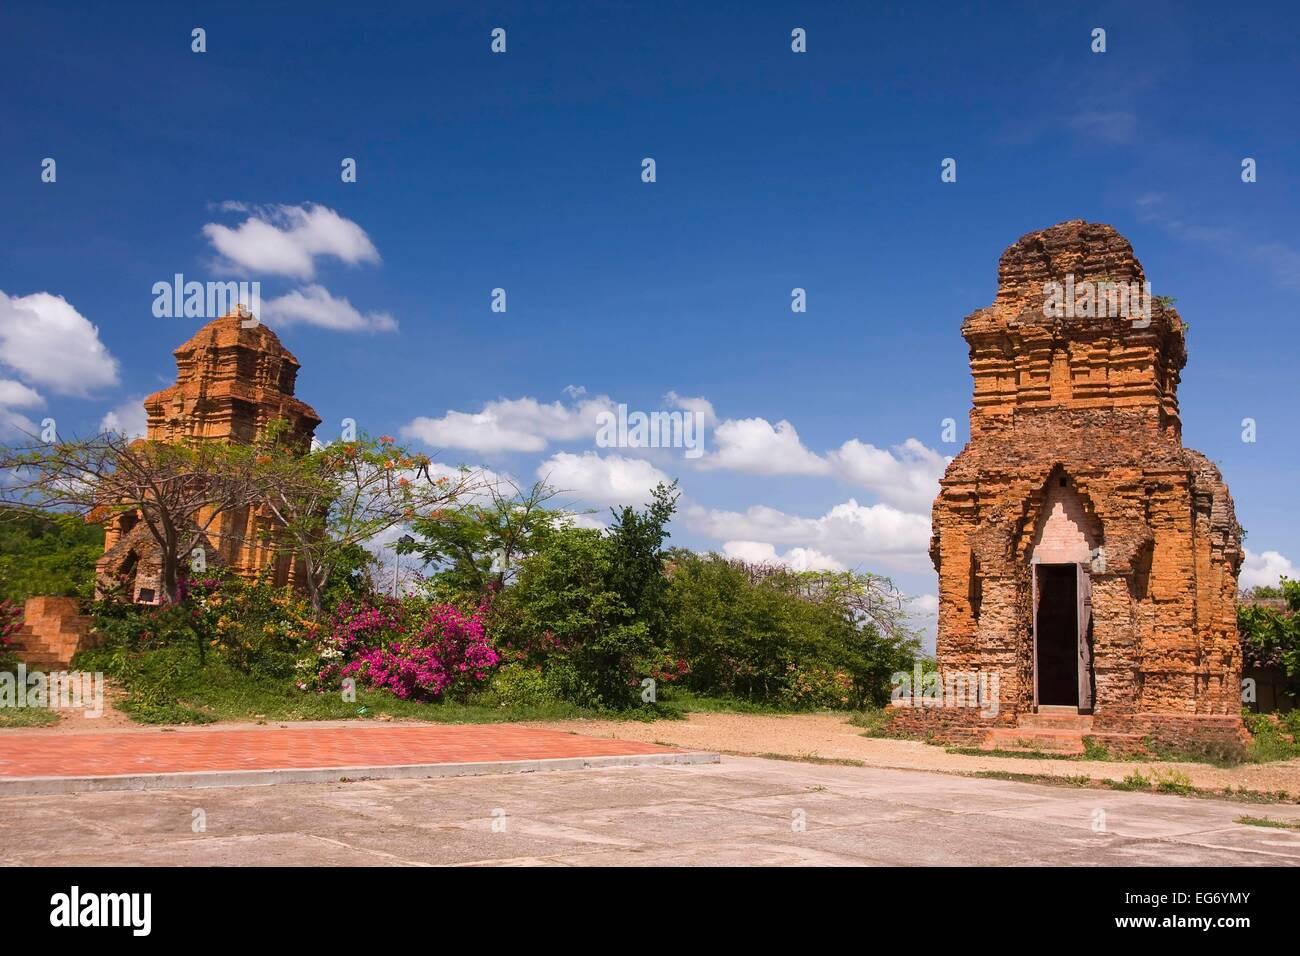 Po Shanu Cham owers, sanctuary, temple complex, Mui Ne, Phan Thiet, Vietnam - Stock Image